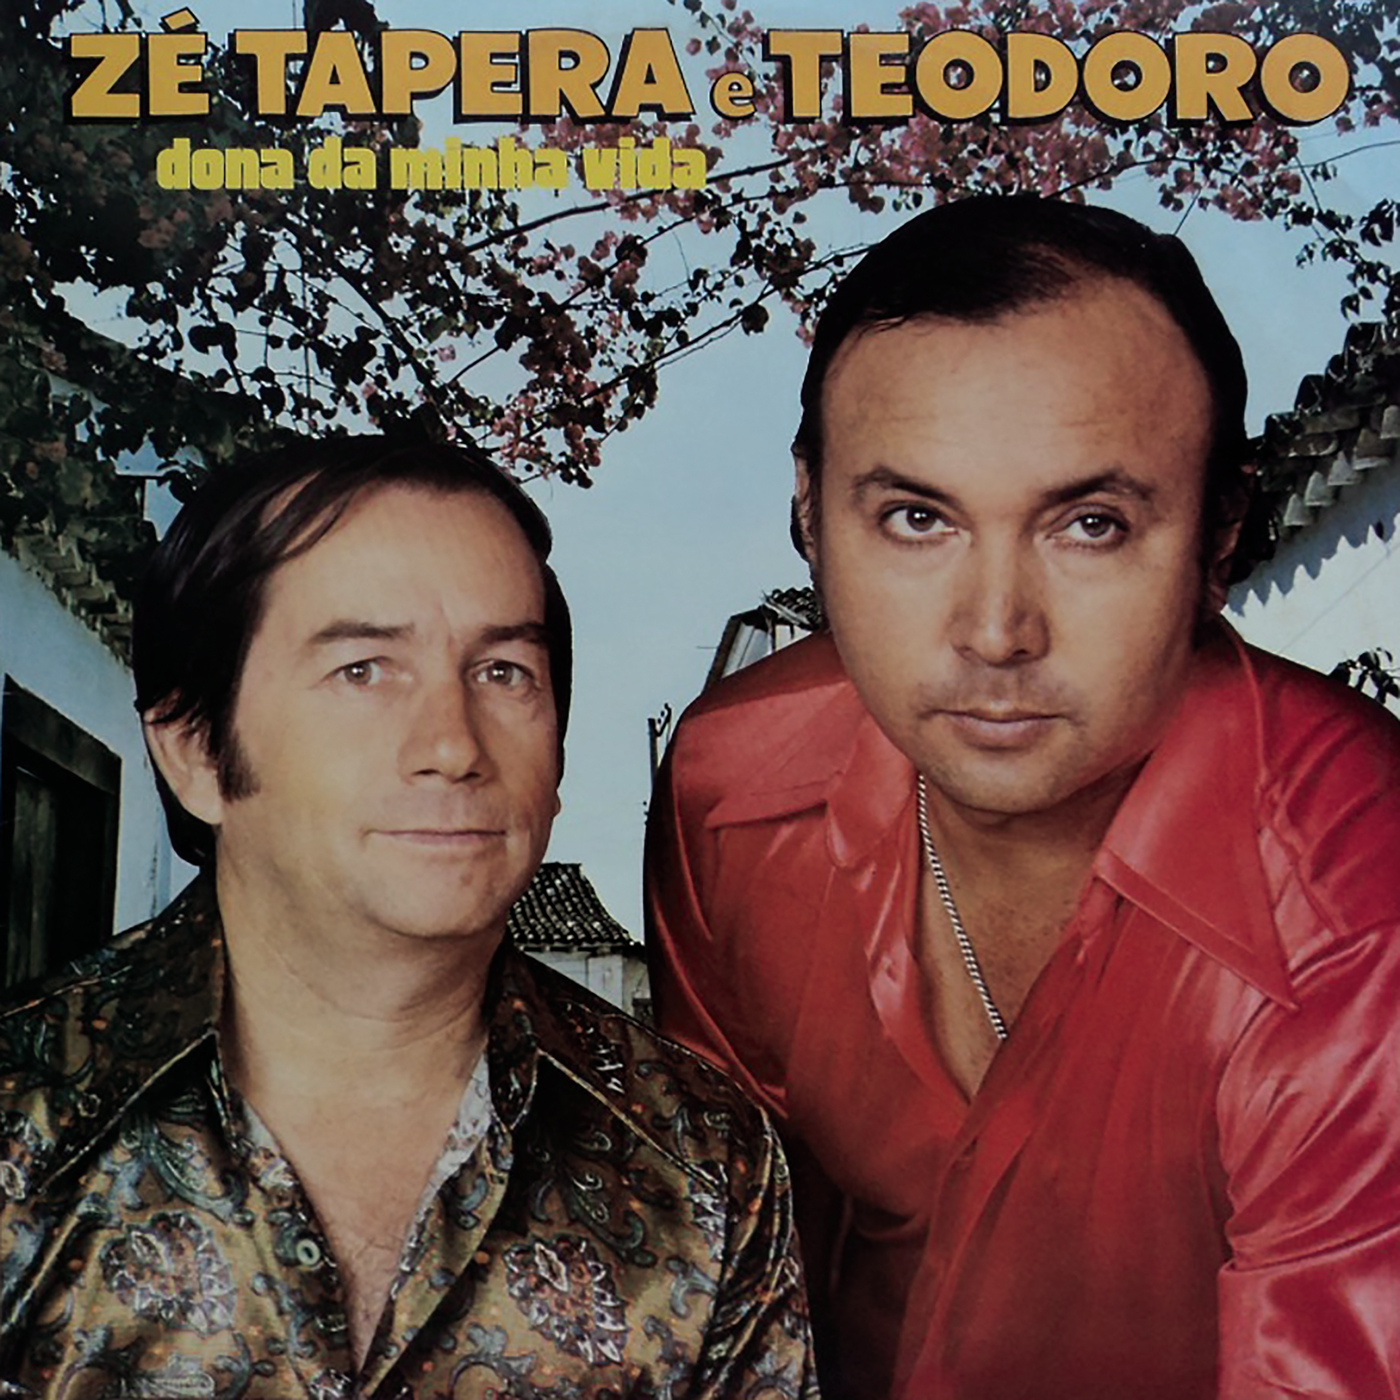 Dona da Minha Vida - Zé Tapera & Teodoro